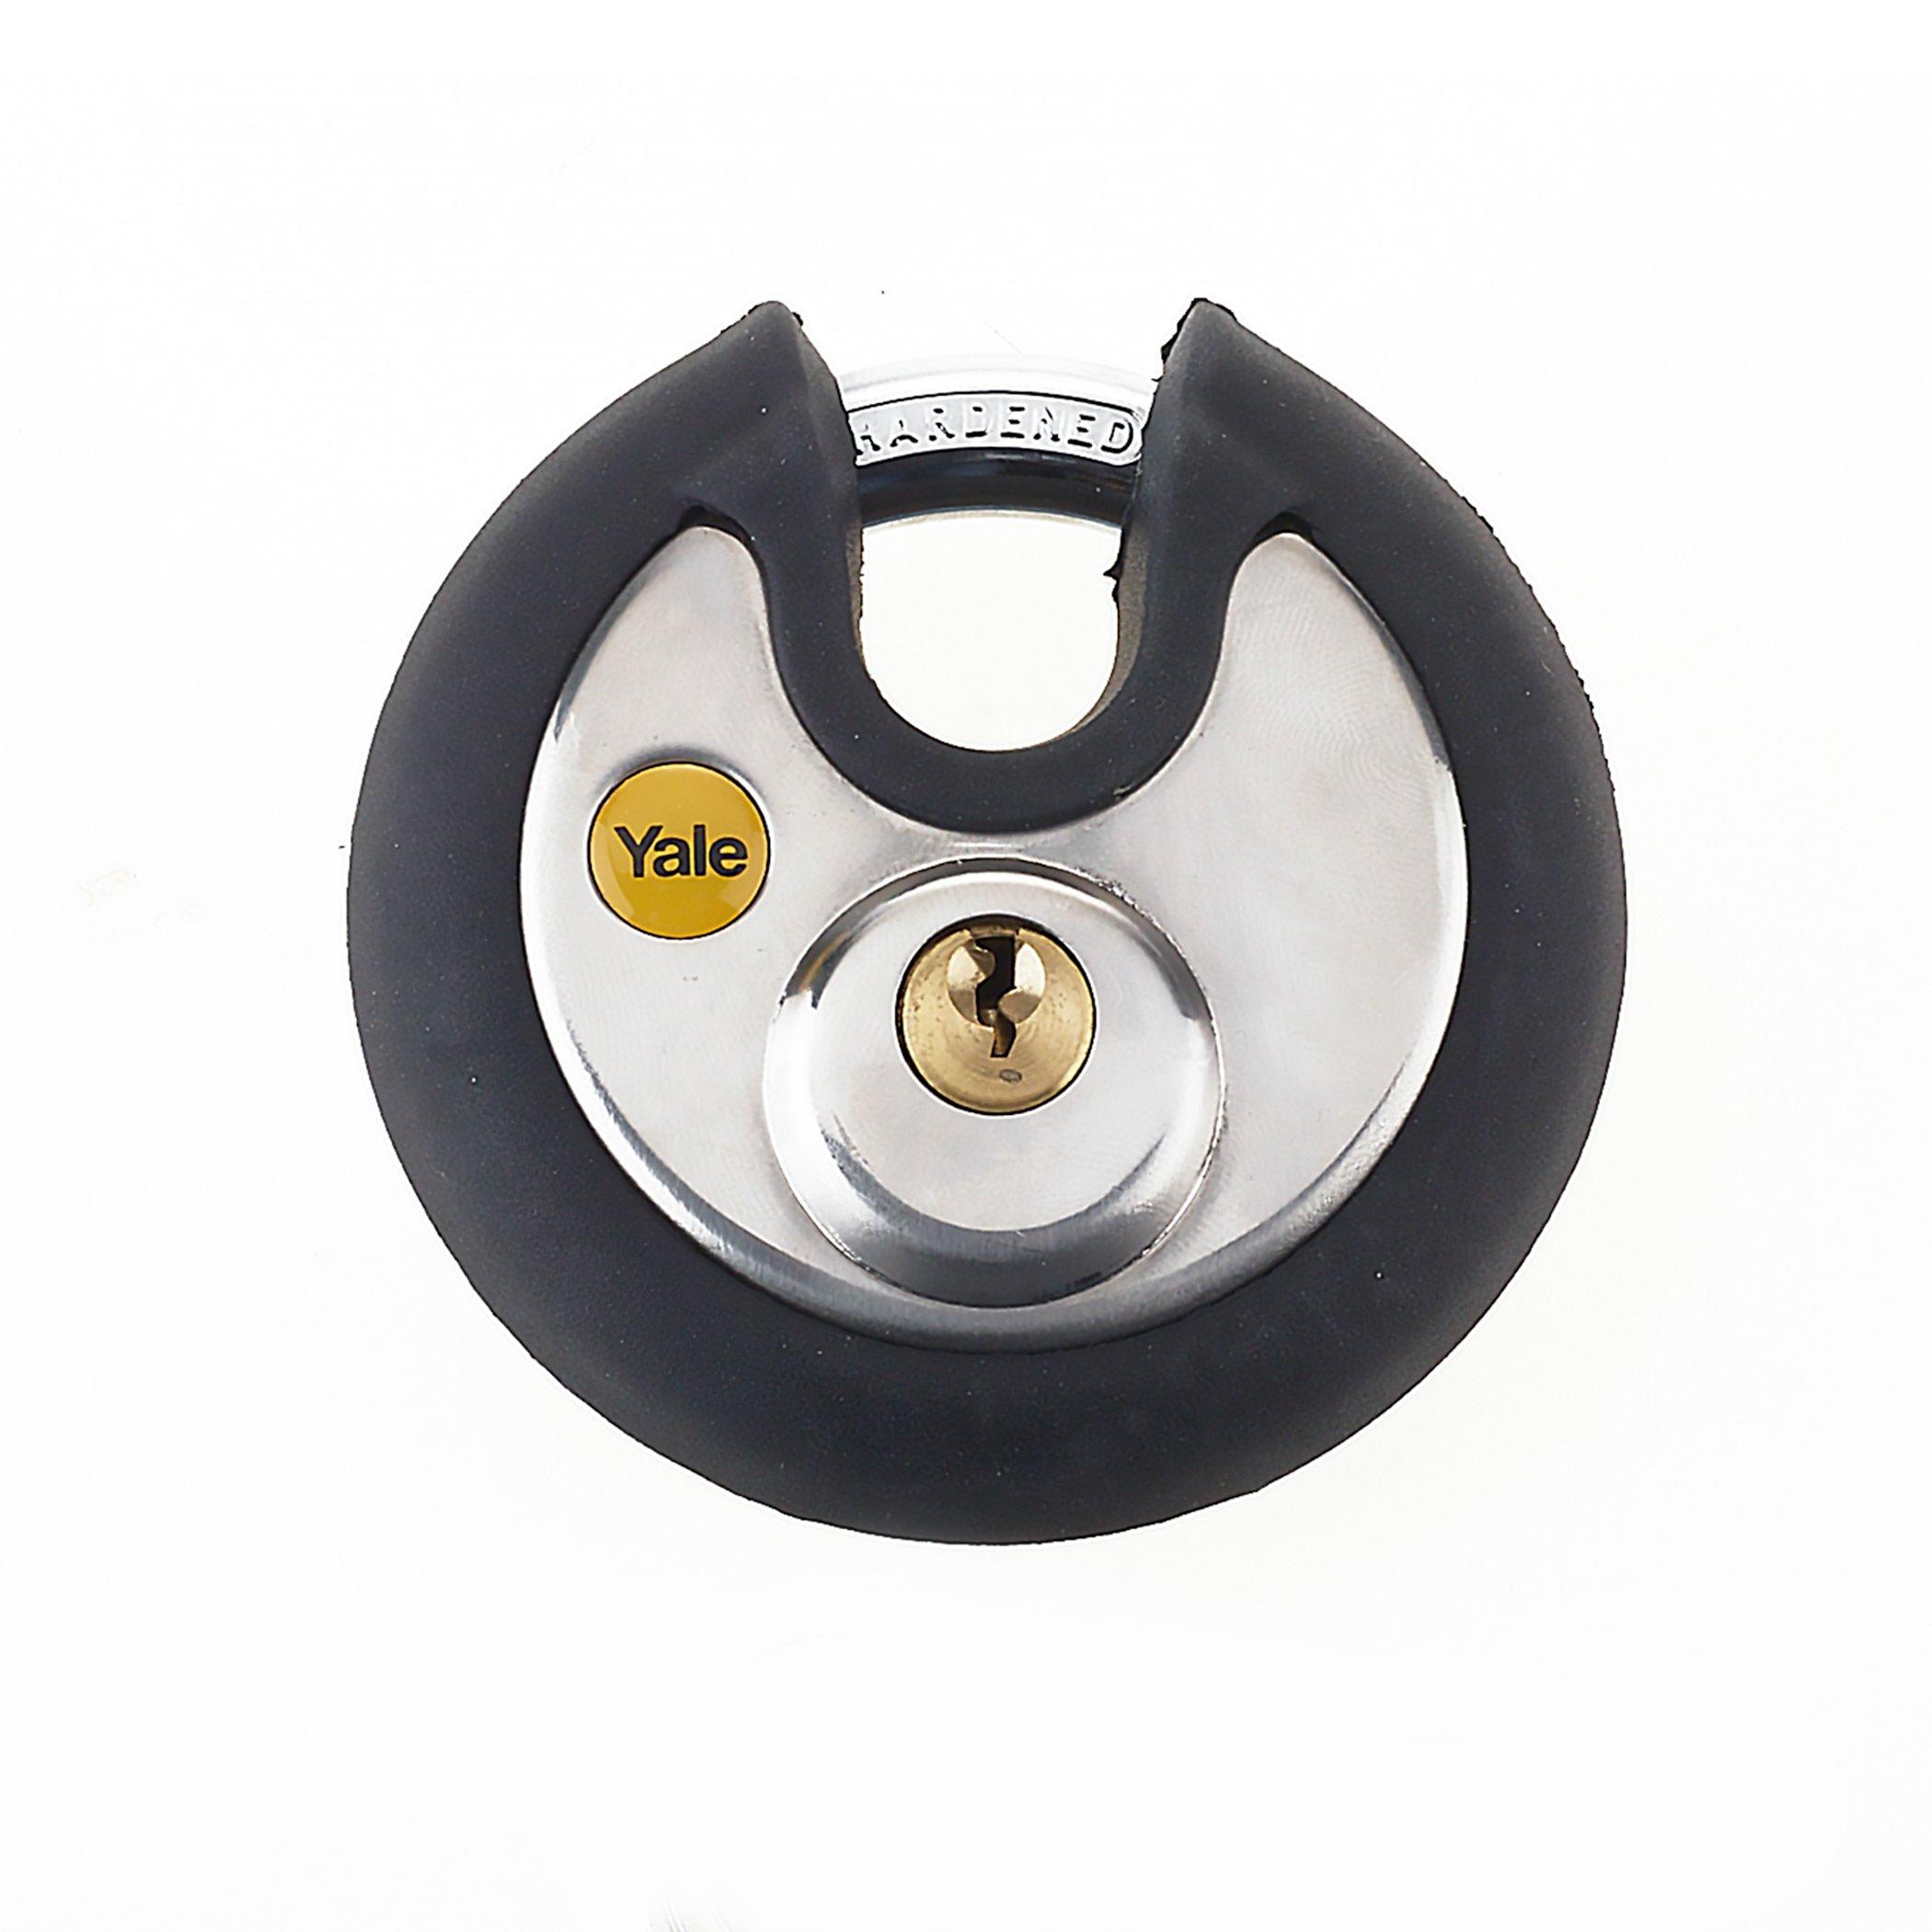 Y130p High Security Anti Cut 70mm Disc Padlock High